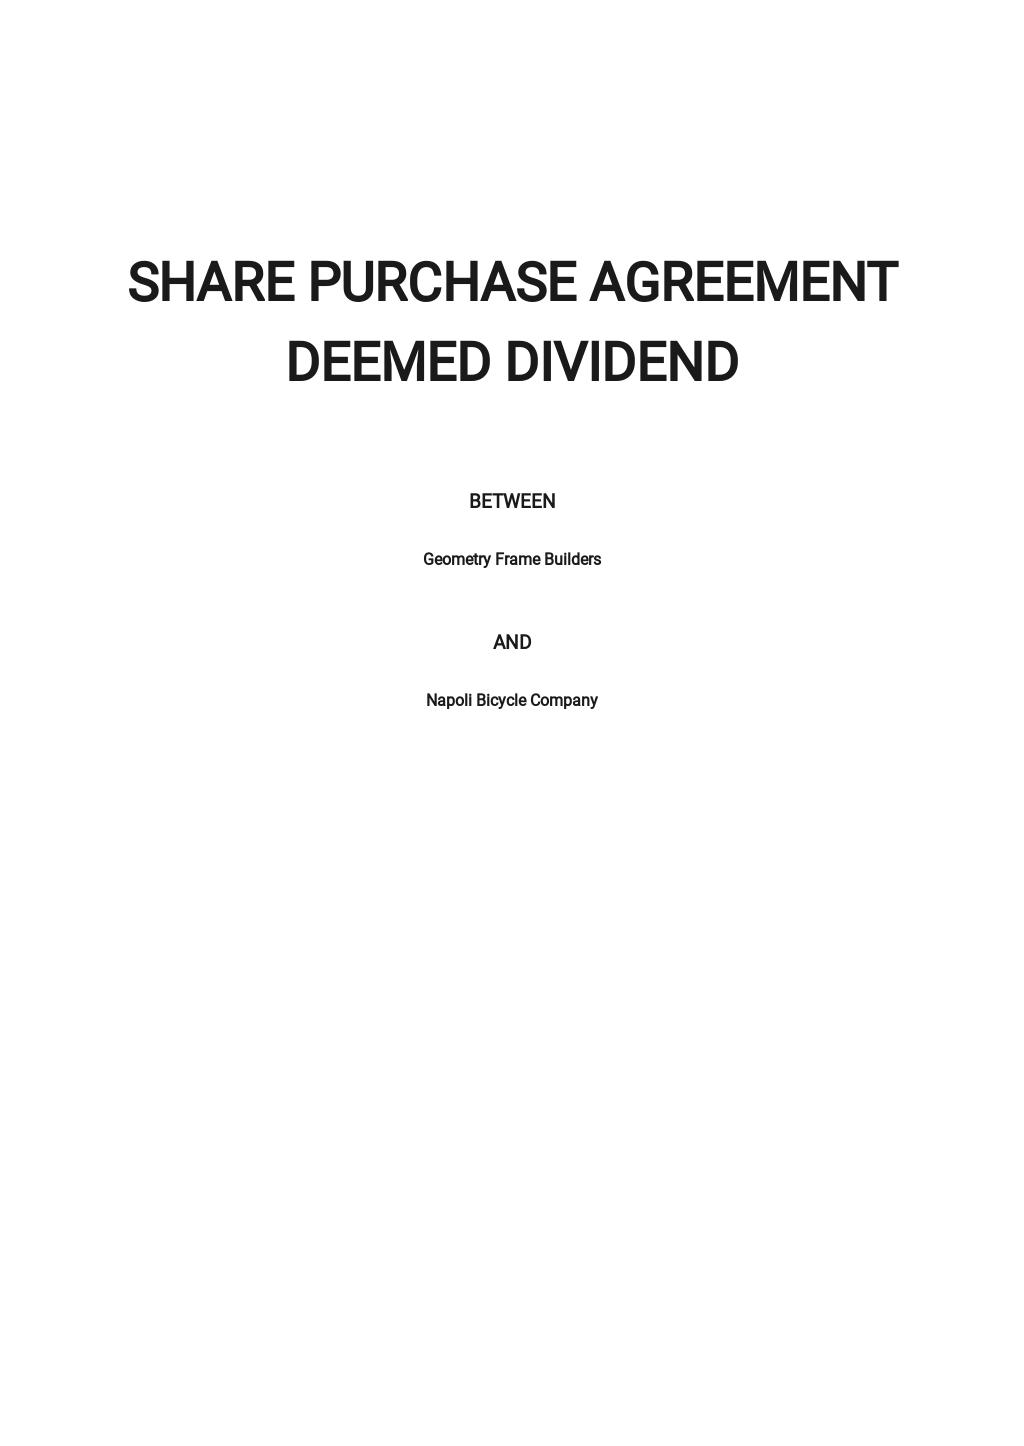 Share Purchase Agreement Deemed Dividend Template.jpe